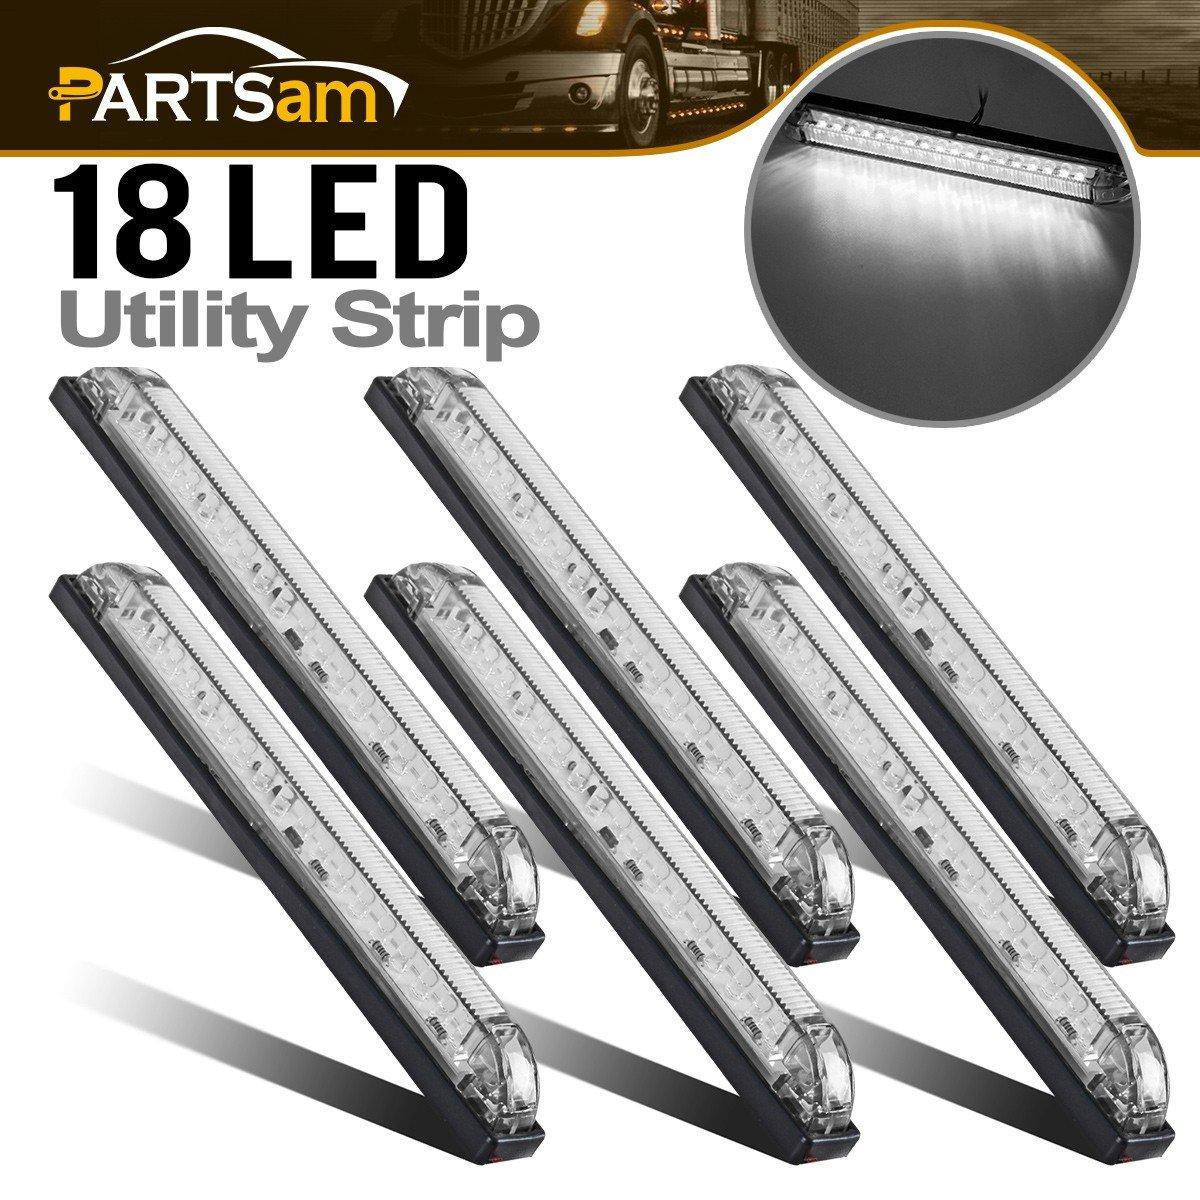 Partsam 6x 8' Marine/Boat Slim Line Clear/White LED Utility Strip Light 18 Diodes Sealed, 8 Inch White Led Strip Bar Marker Clearance Lights